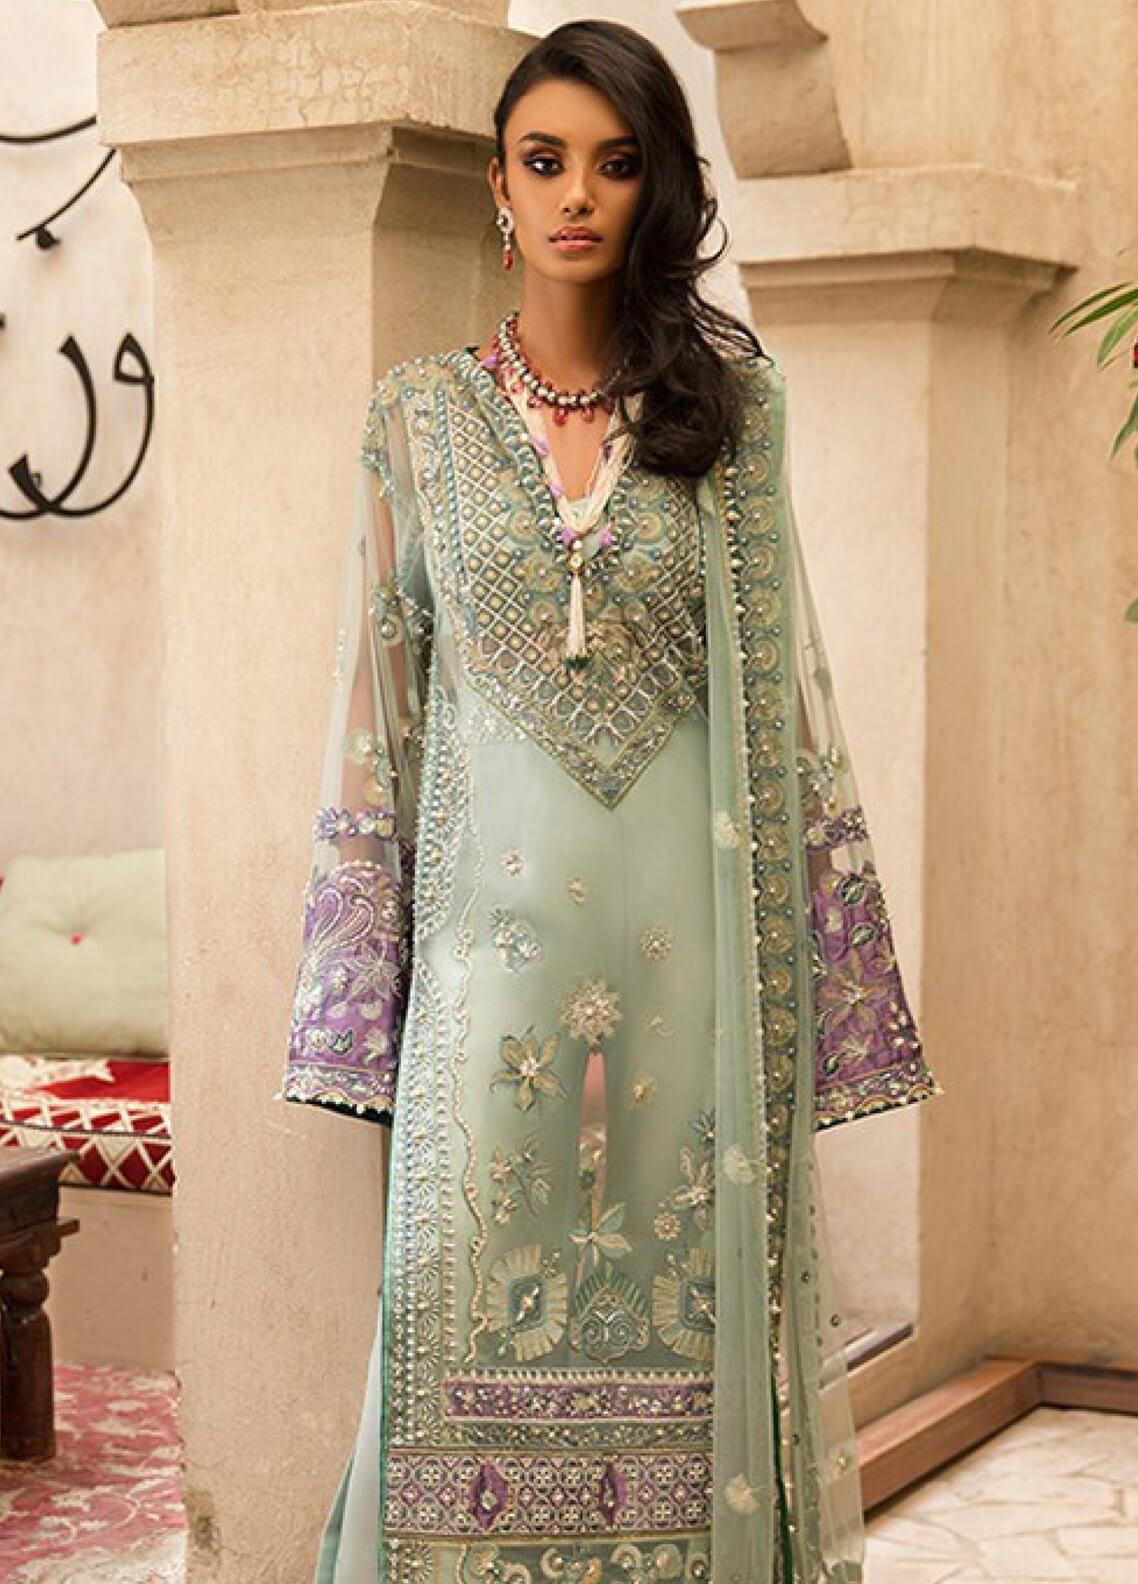 Elan Collection 2019 Latest Unstitched  Embroidery Pakistani Shalwar Kameez Suit